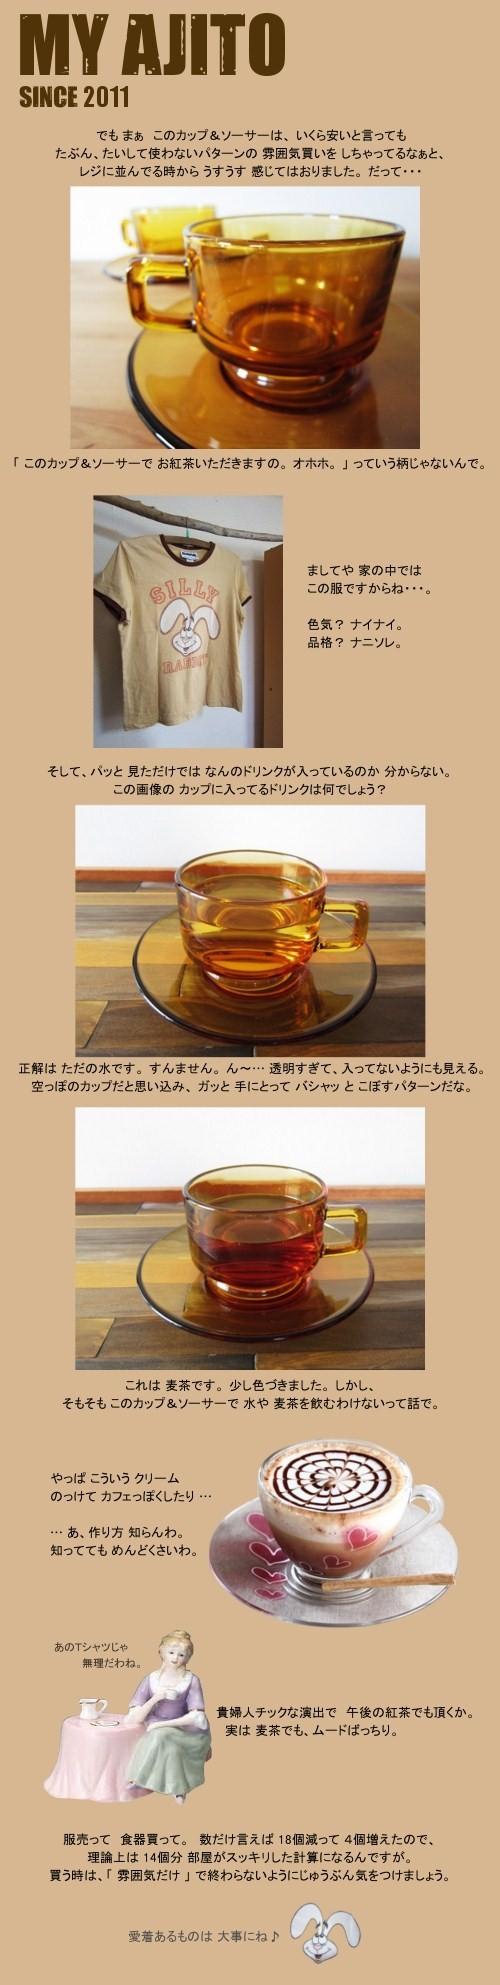 recy_4.jpg